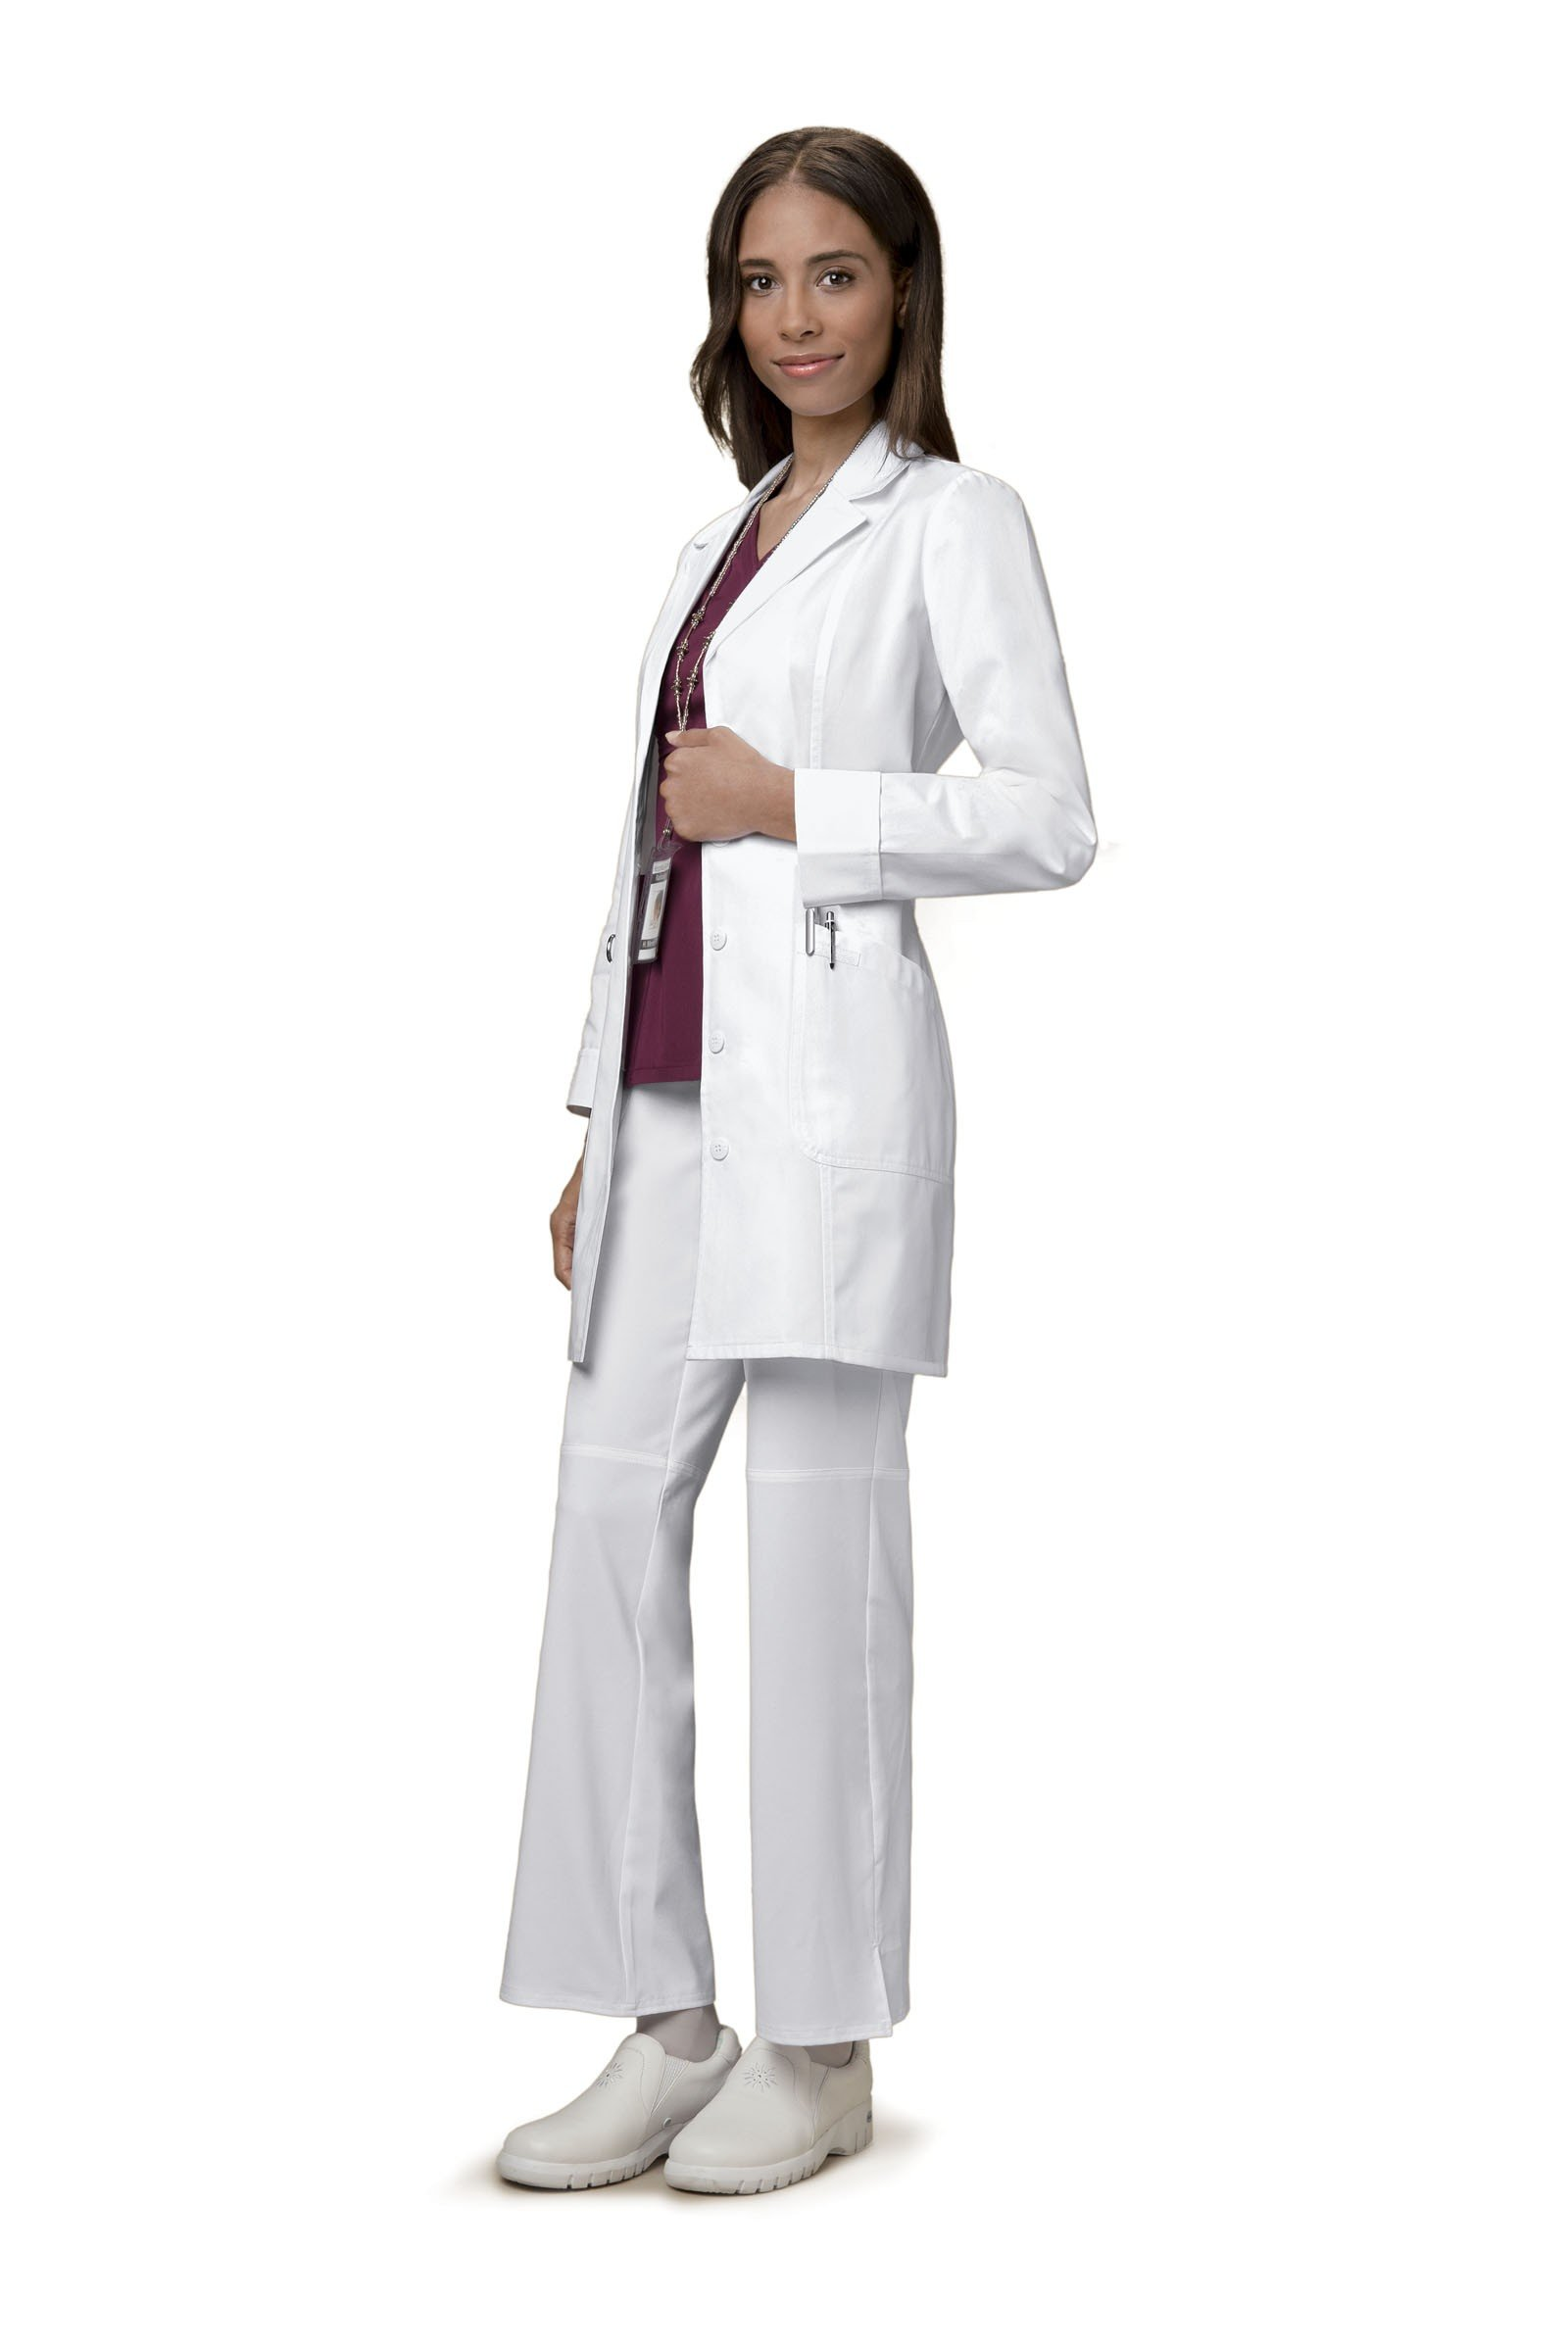 Медицинский халат женский CHEROKEE 2410 [цвет: Белый; размер: M]